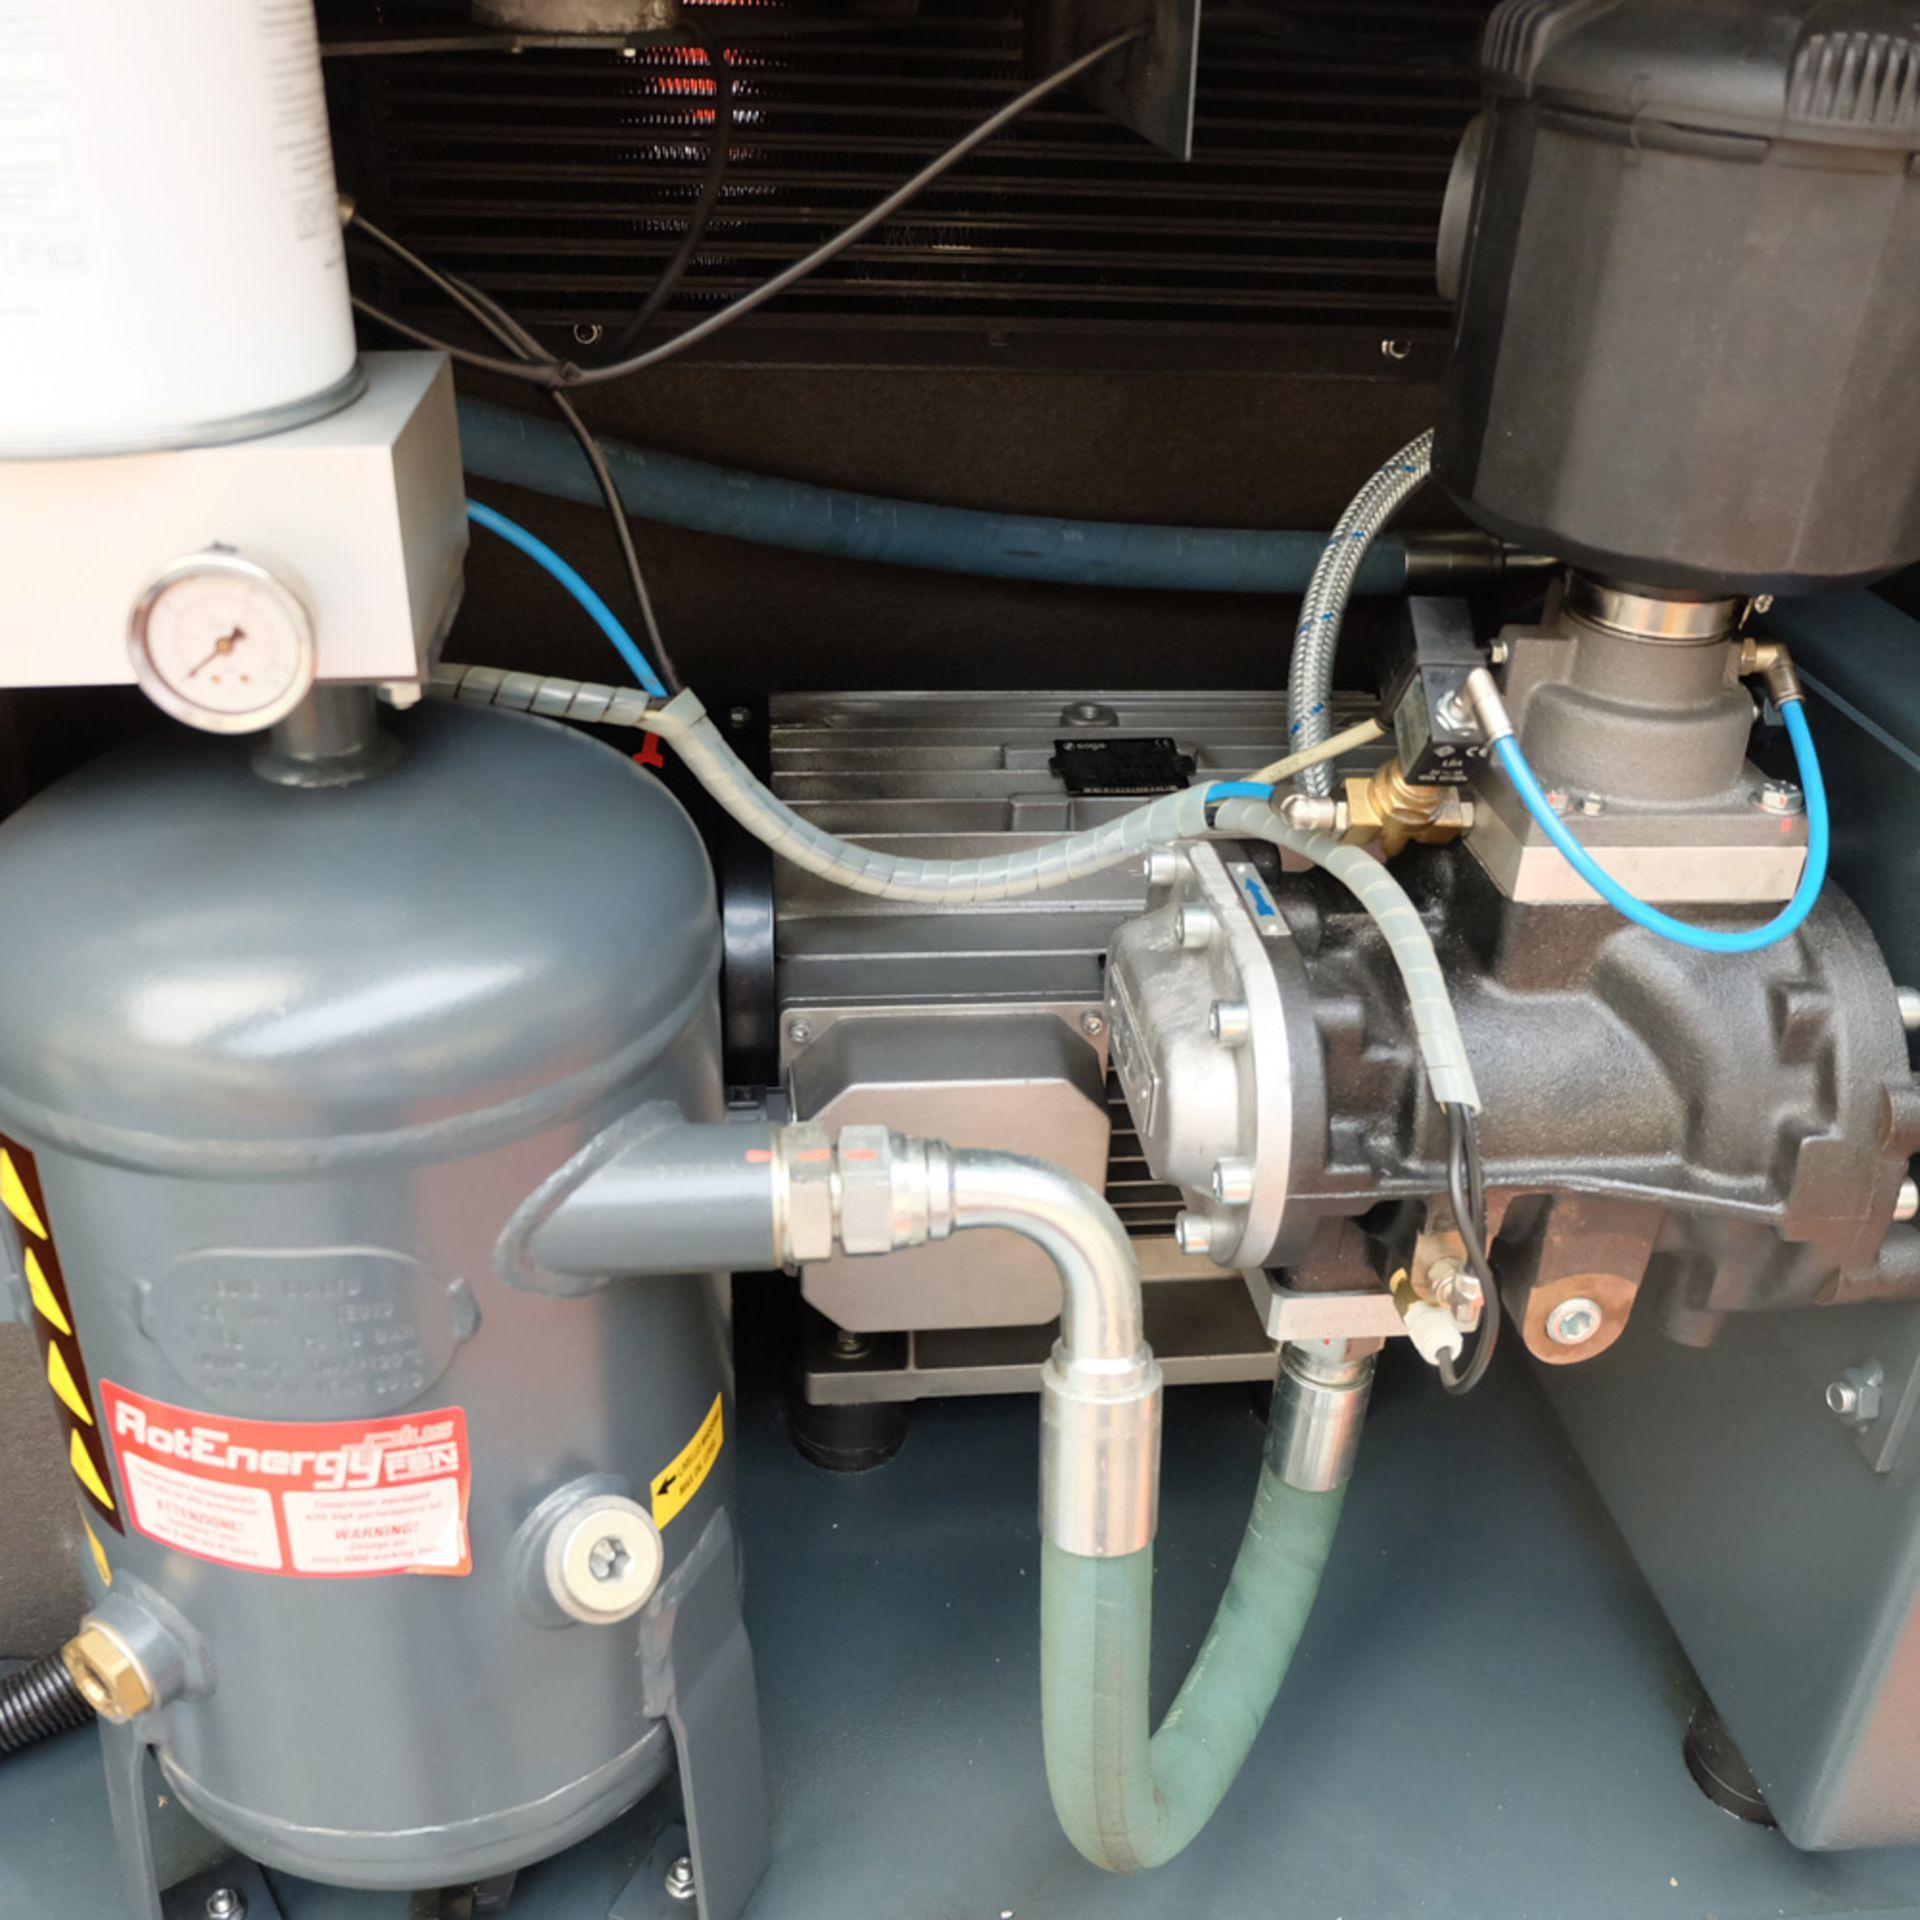 FINI VISION 25 Rotary Screw Compressor. - Image 10 of 11